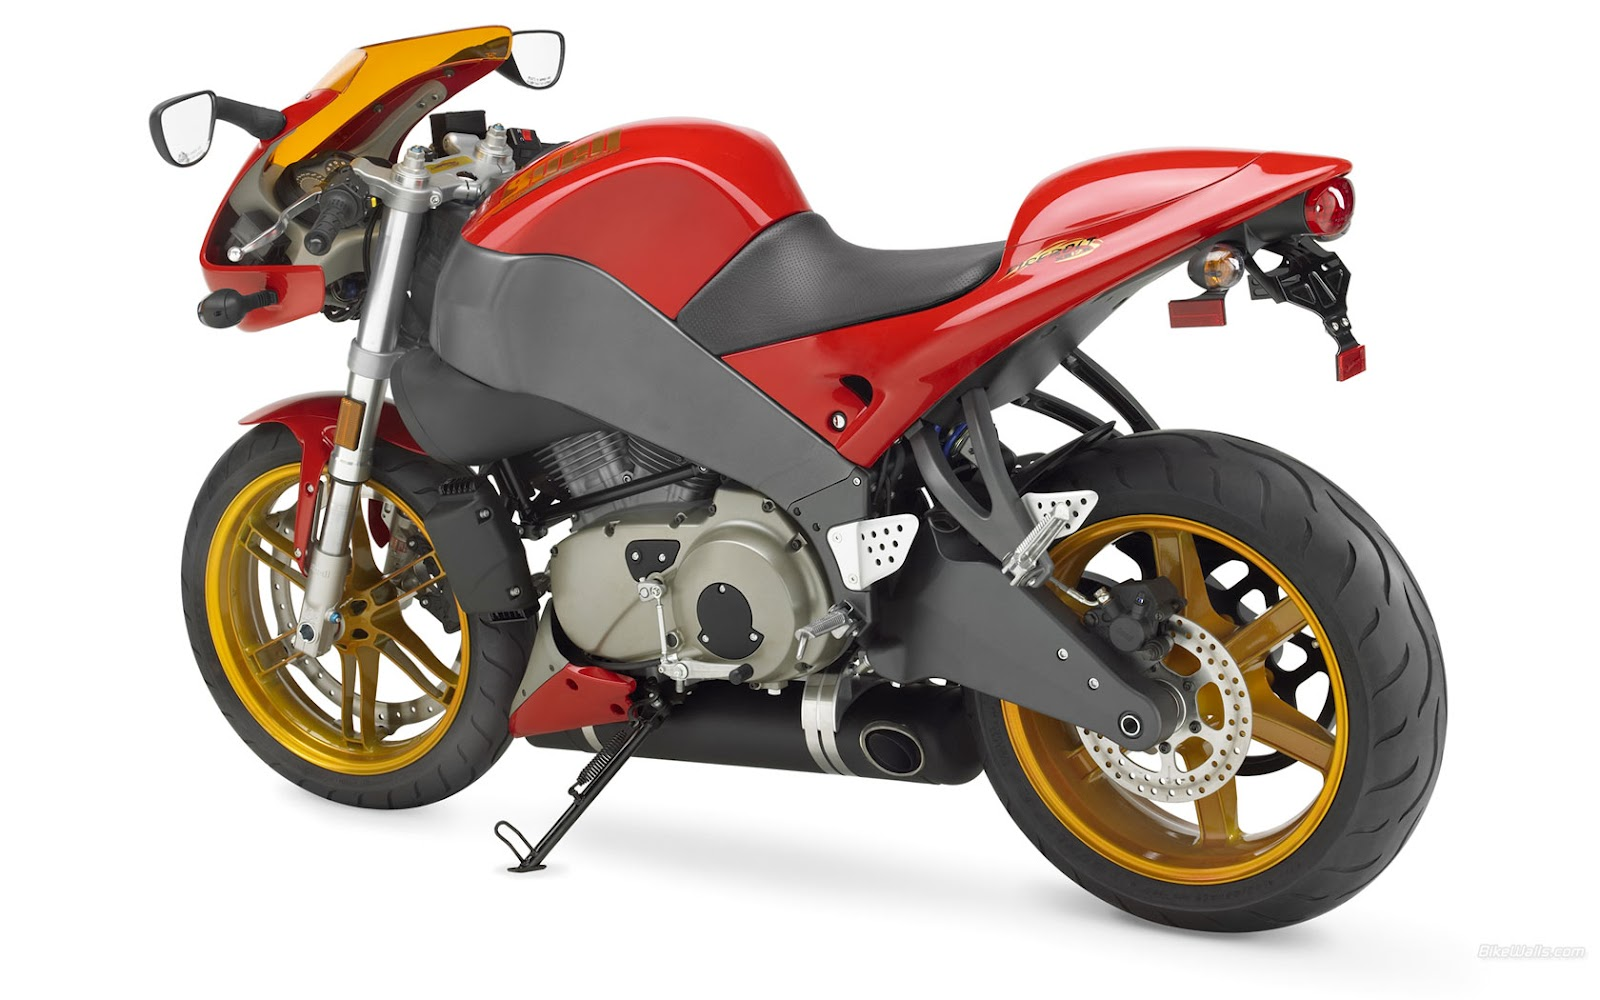 http://3.bp.blogspot.com/-ZsX004bSbIg/T0qPXnSCFuI/AAAAAAAAA-U/BM6Tf6T-_n4/s1600/HD+Mix+Bikes+2012+%25281%2529.jpg